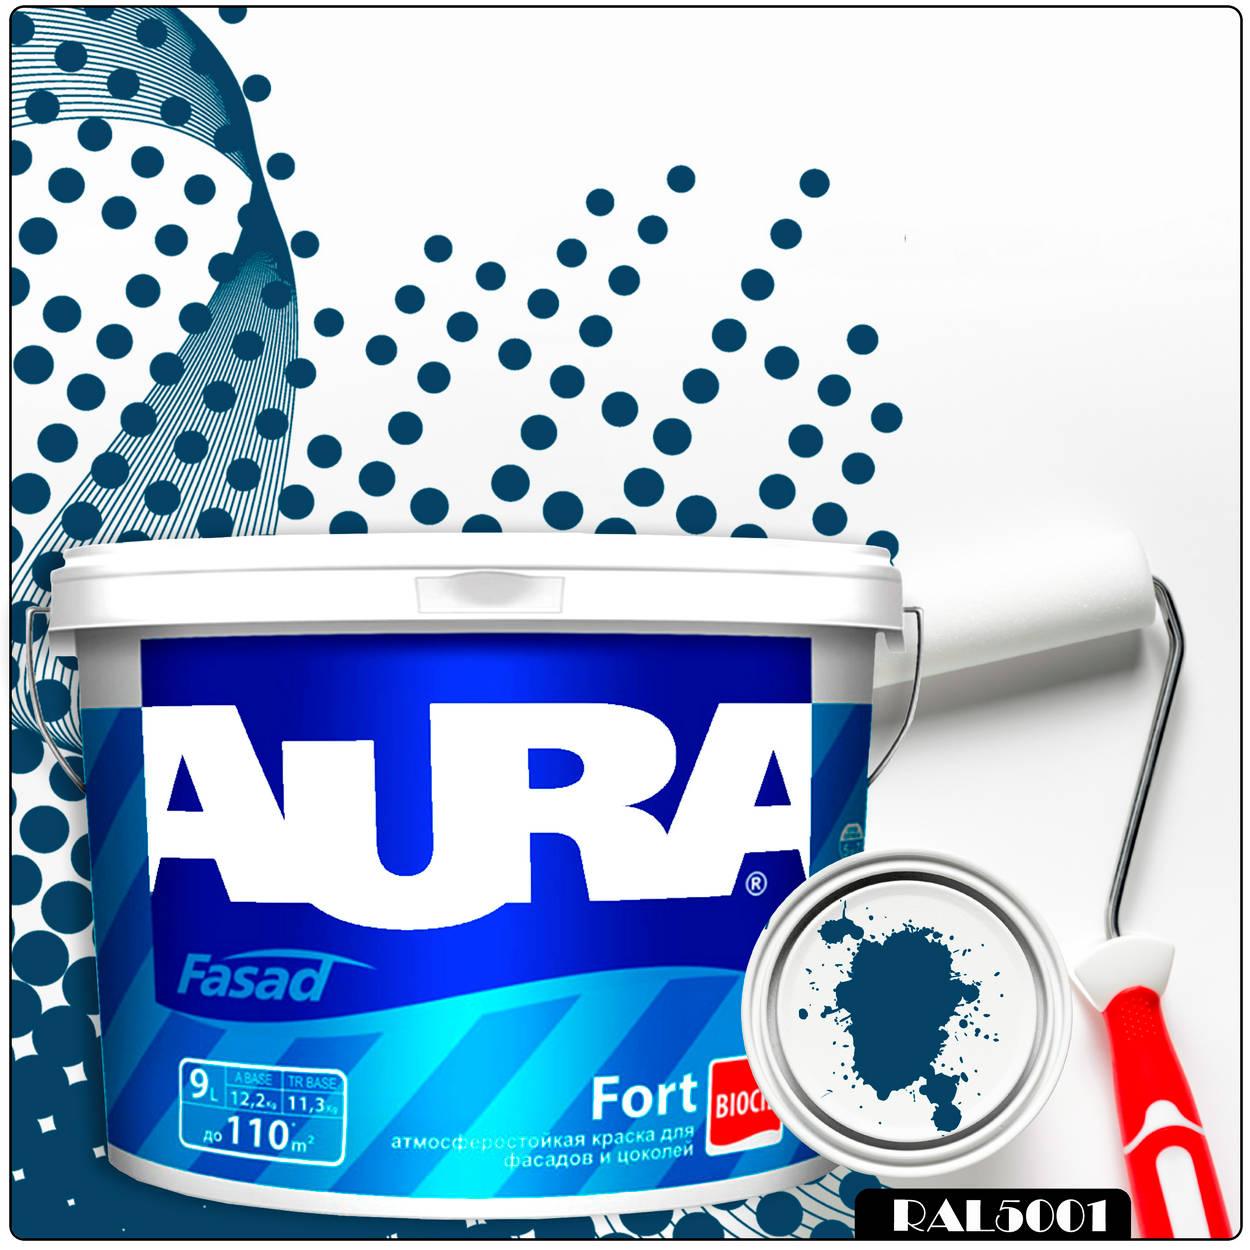 Фото 2 - Краска Aura Fasad Fort, RAL 5001 Зелёно-синий, латексная, матовая, для фасада и цоколей, 9л, Аура.